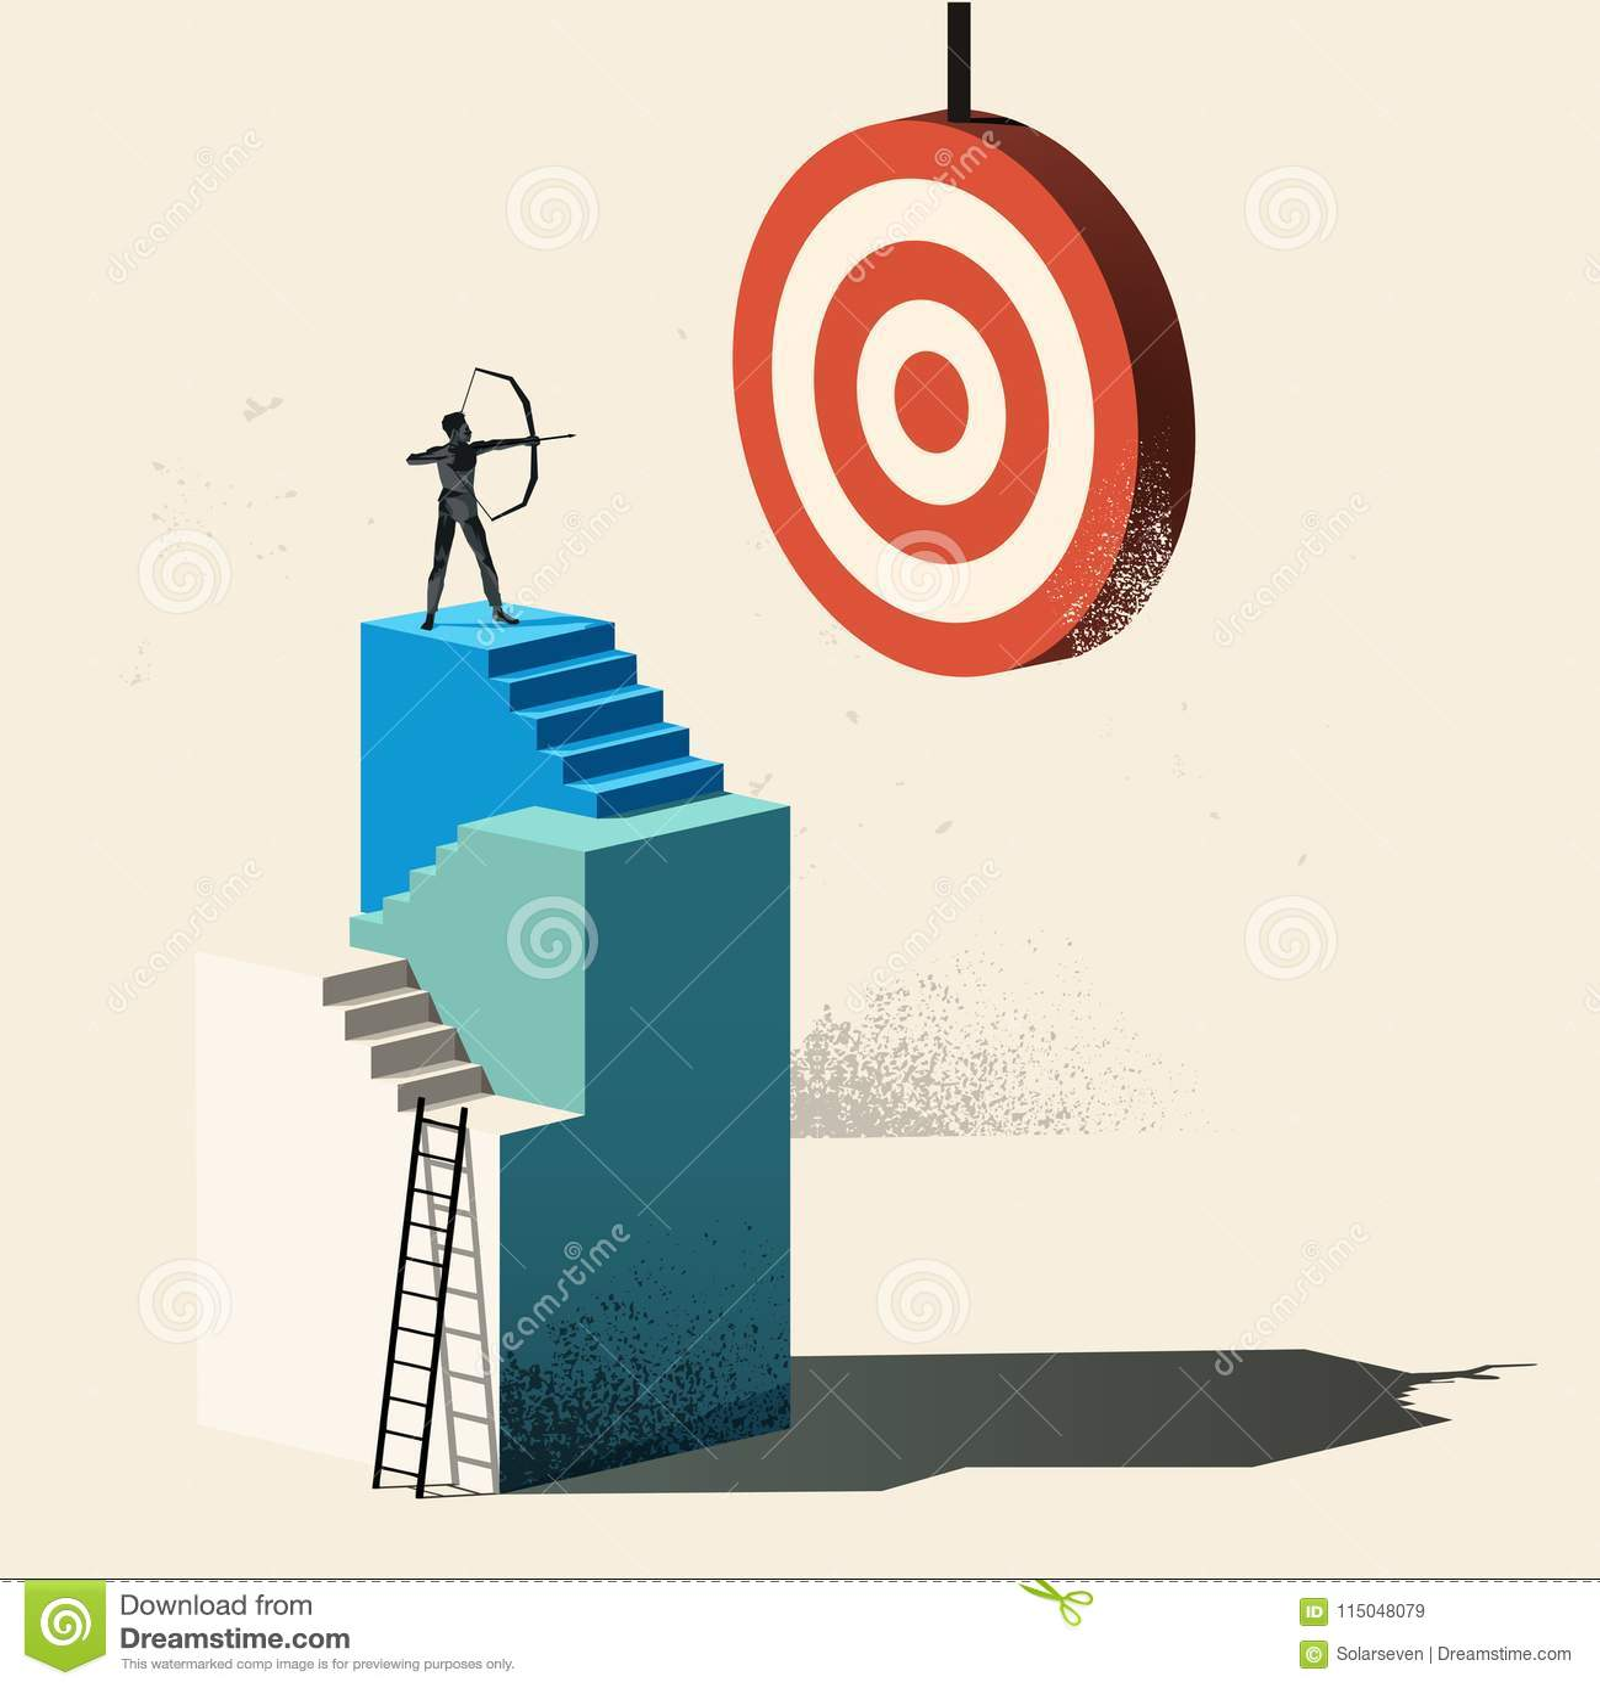 Business Target - Aim High